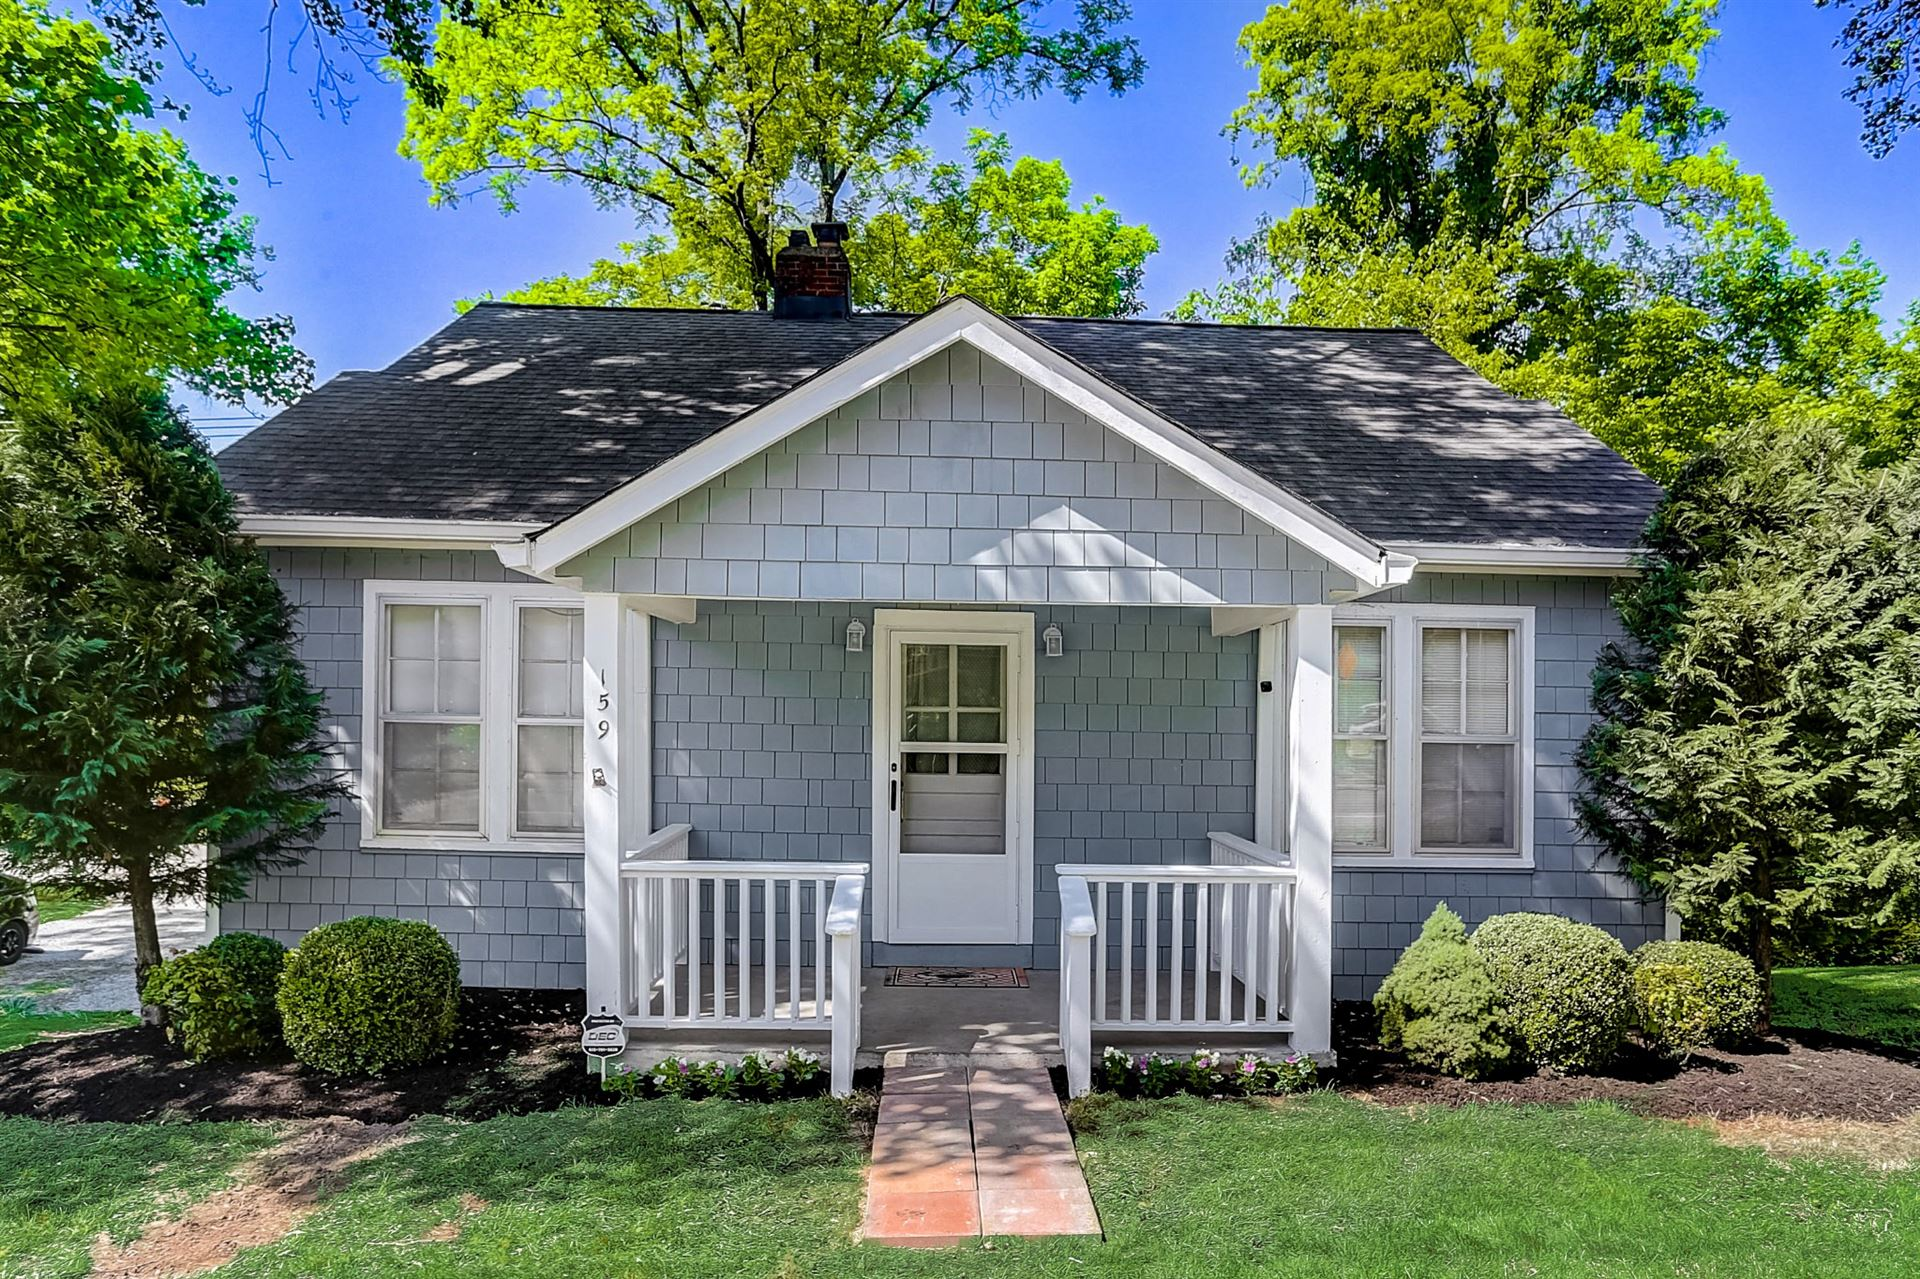 159 Tusculum Rd, Antioch, TN 37013 - MLS#: 2253578